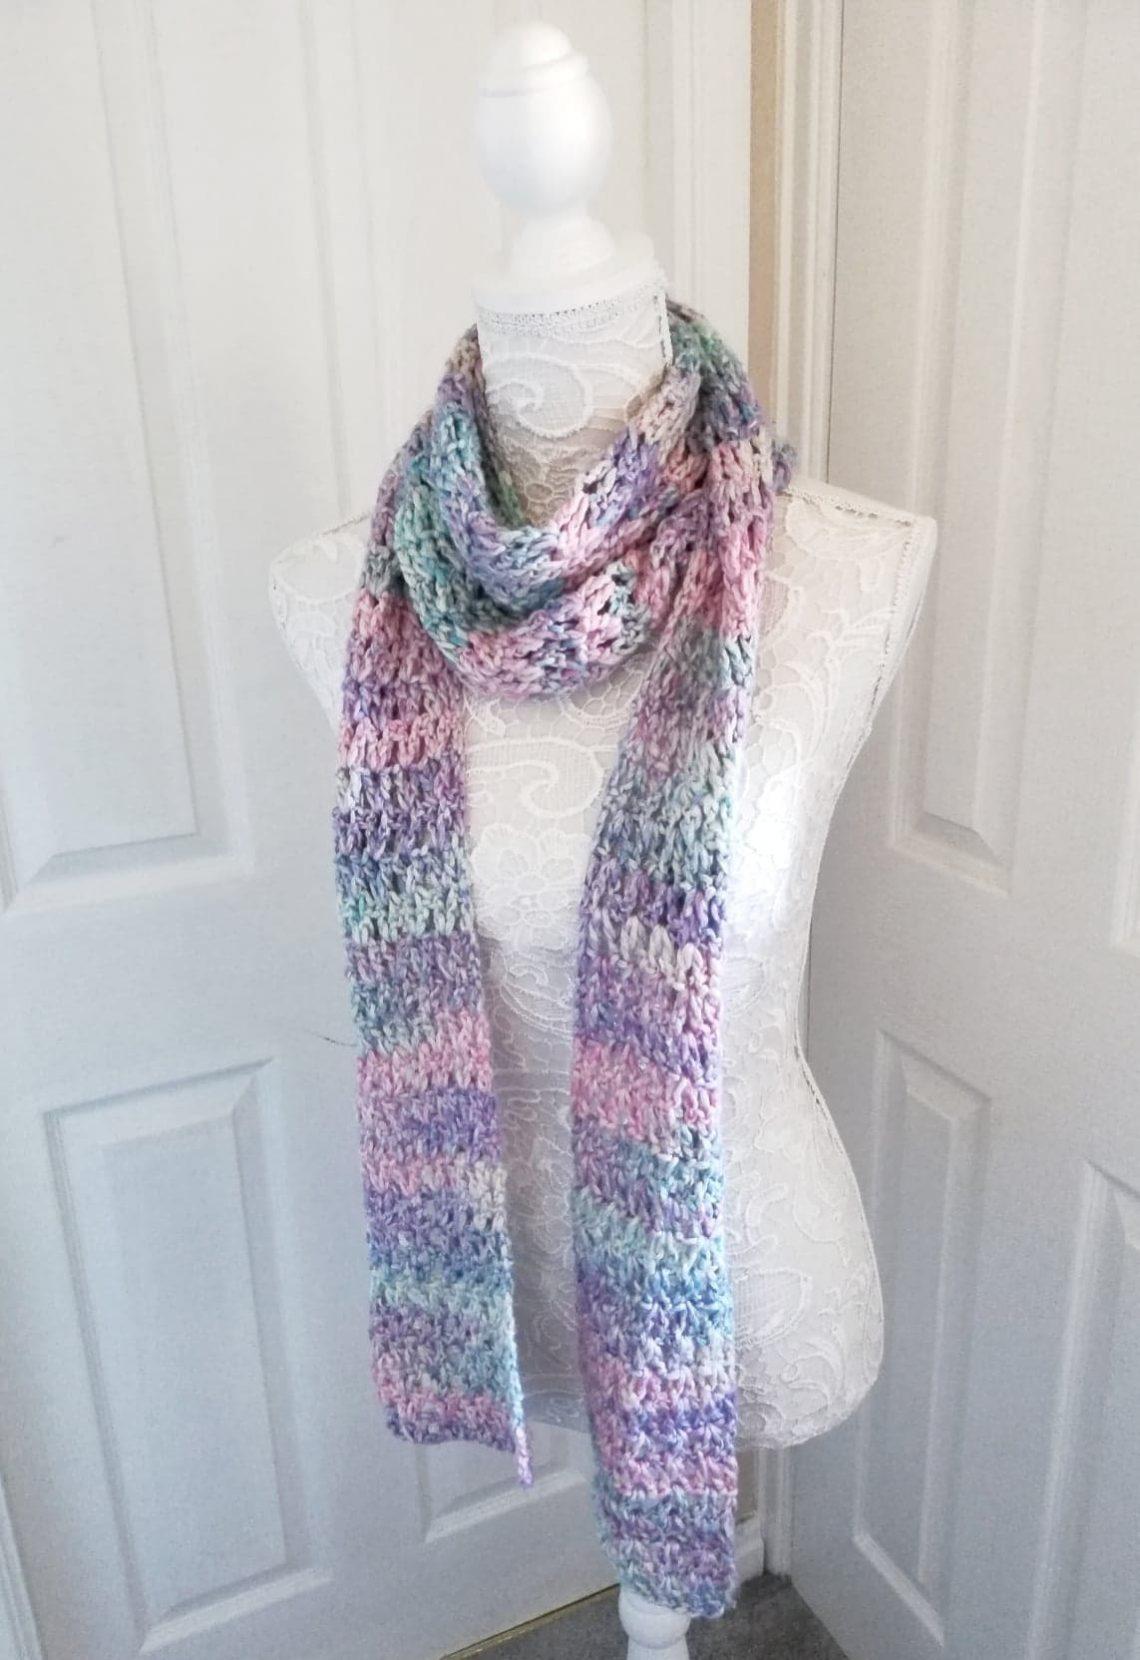 Crochet a Feminine Spring Scarf by Selina Veronique Crochet